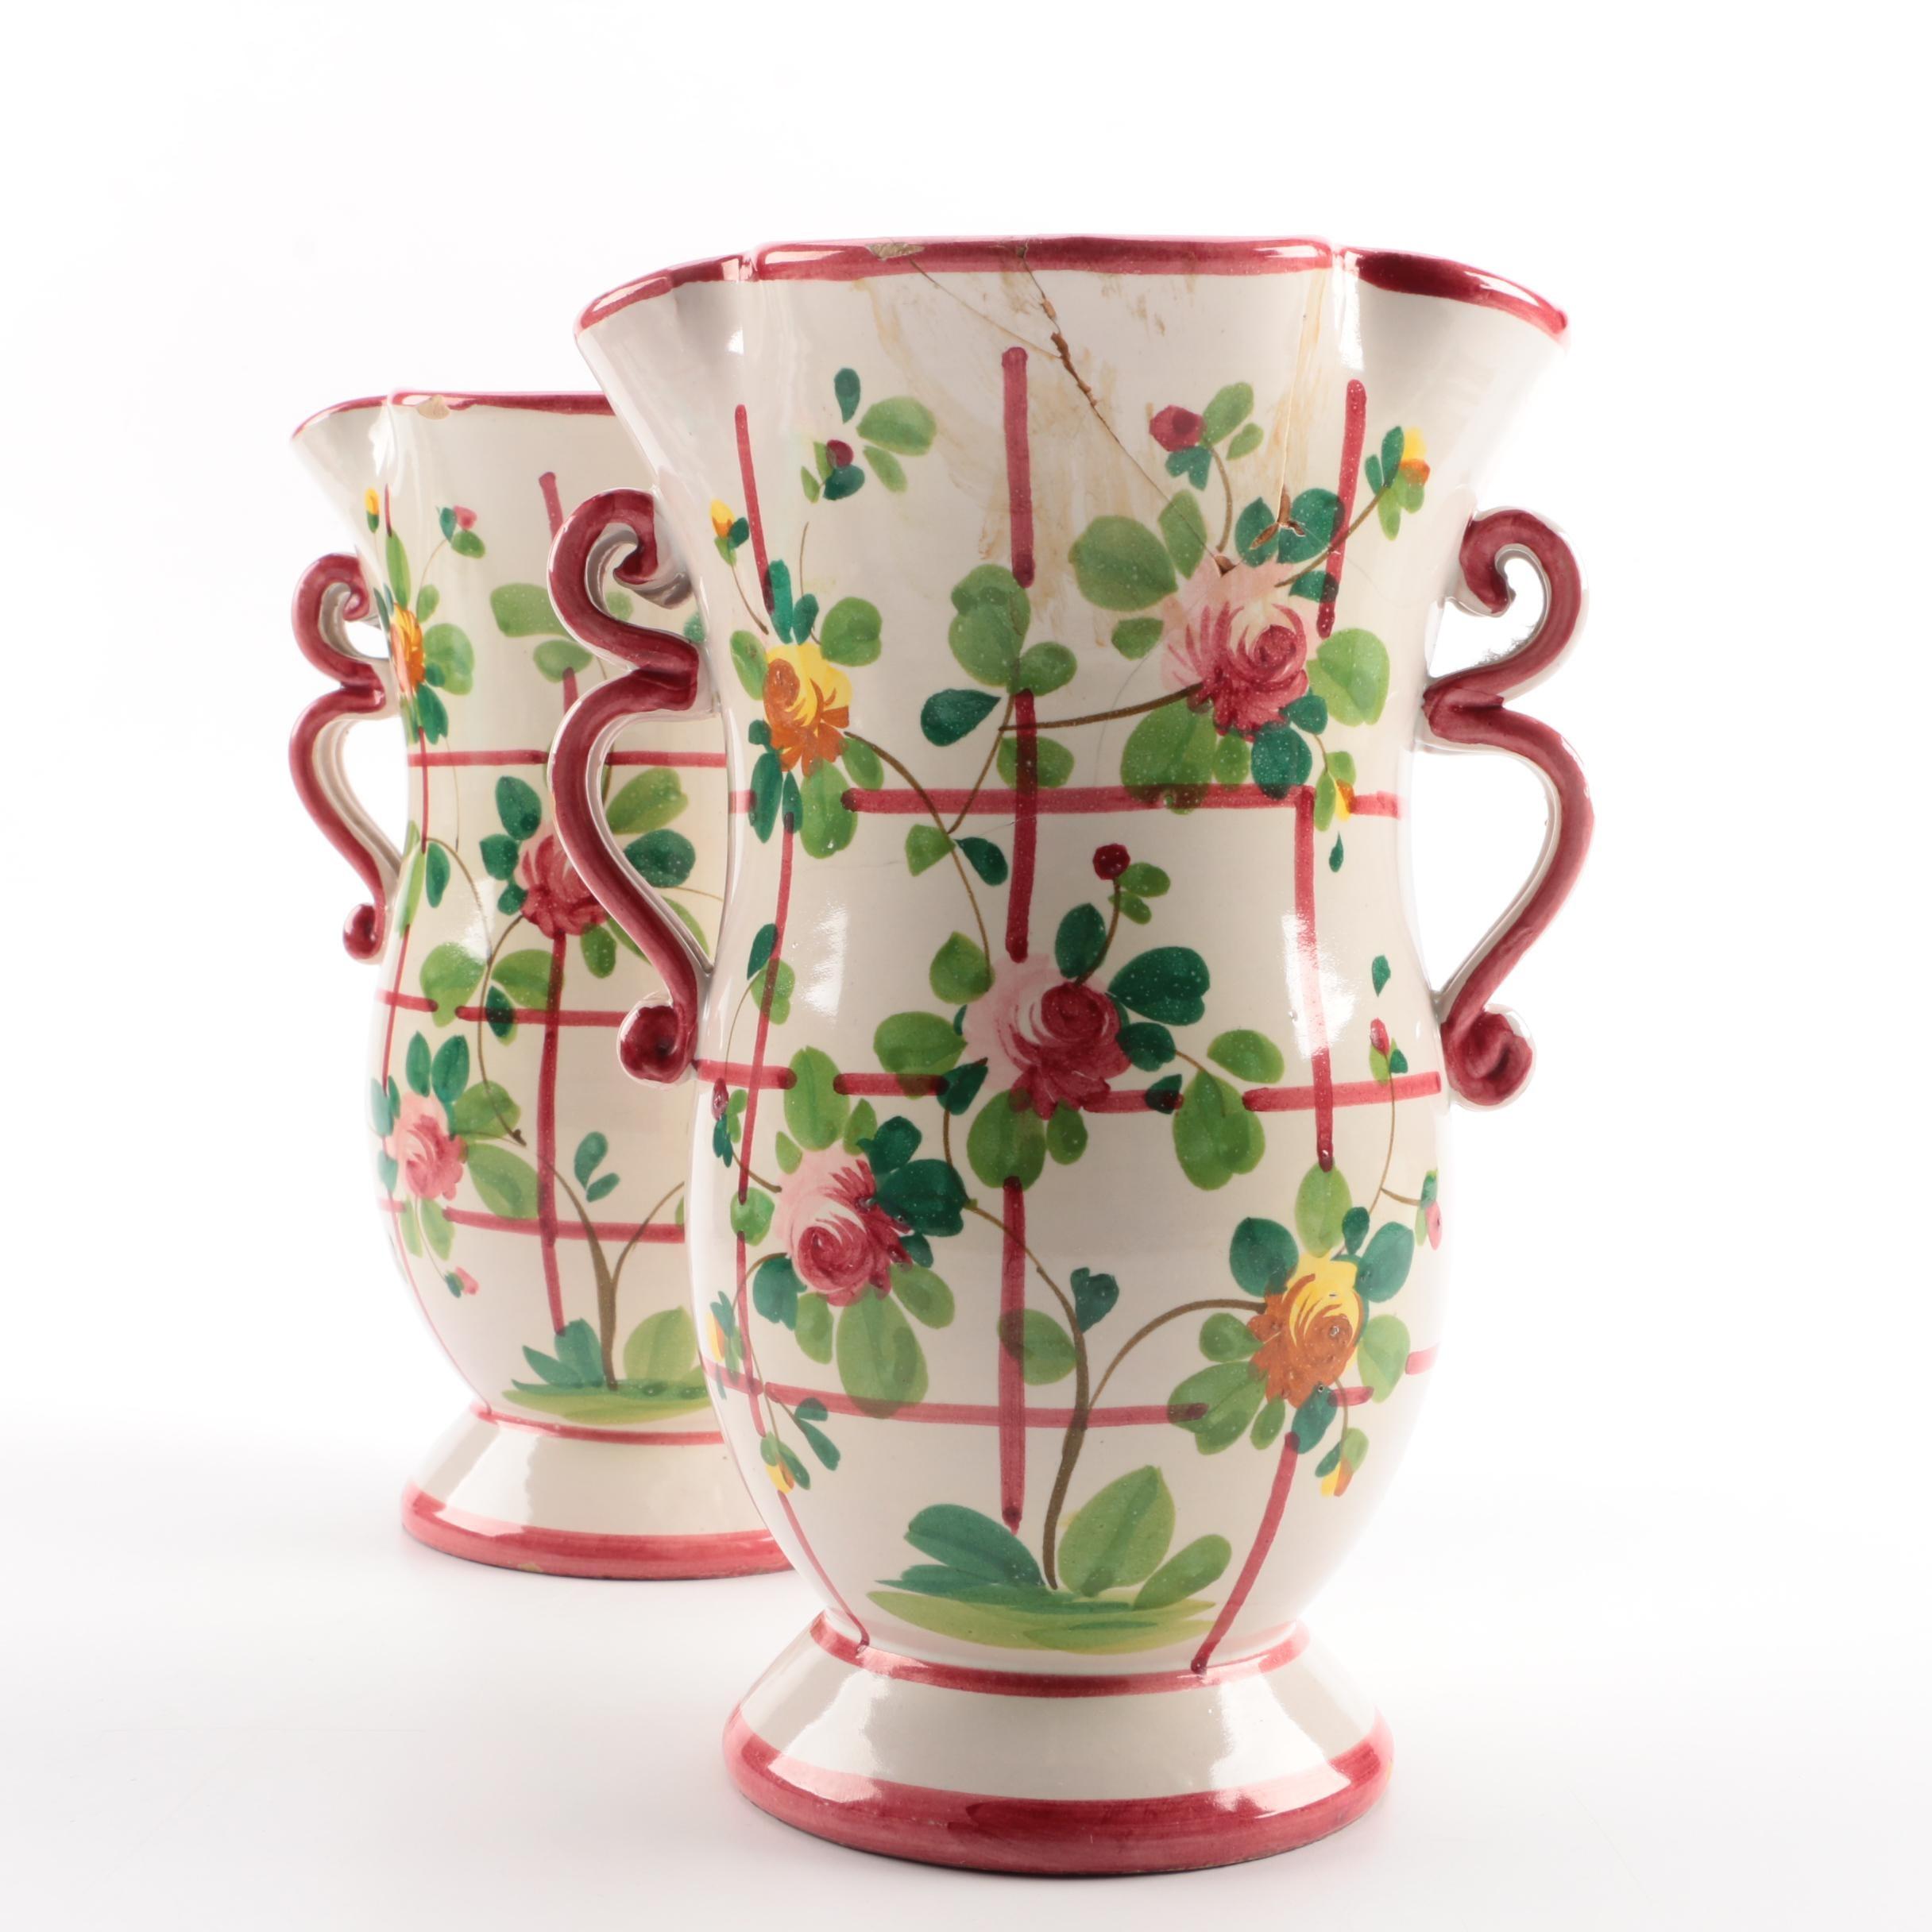 Pair of Italian Pottery Vases